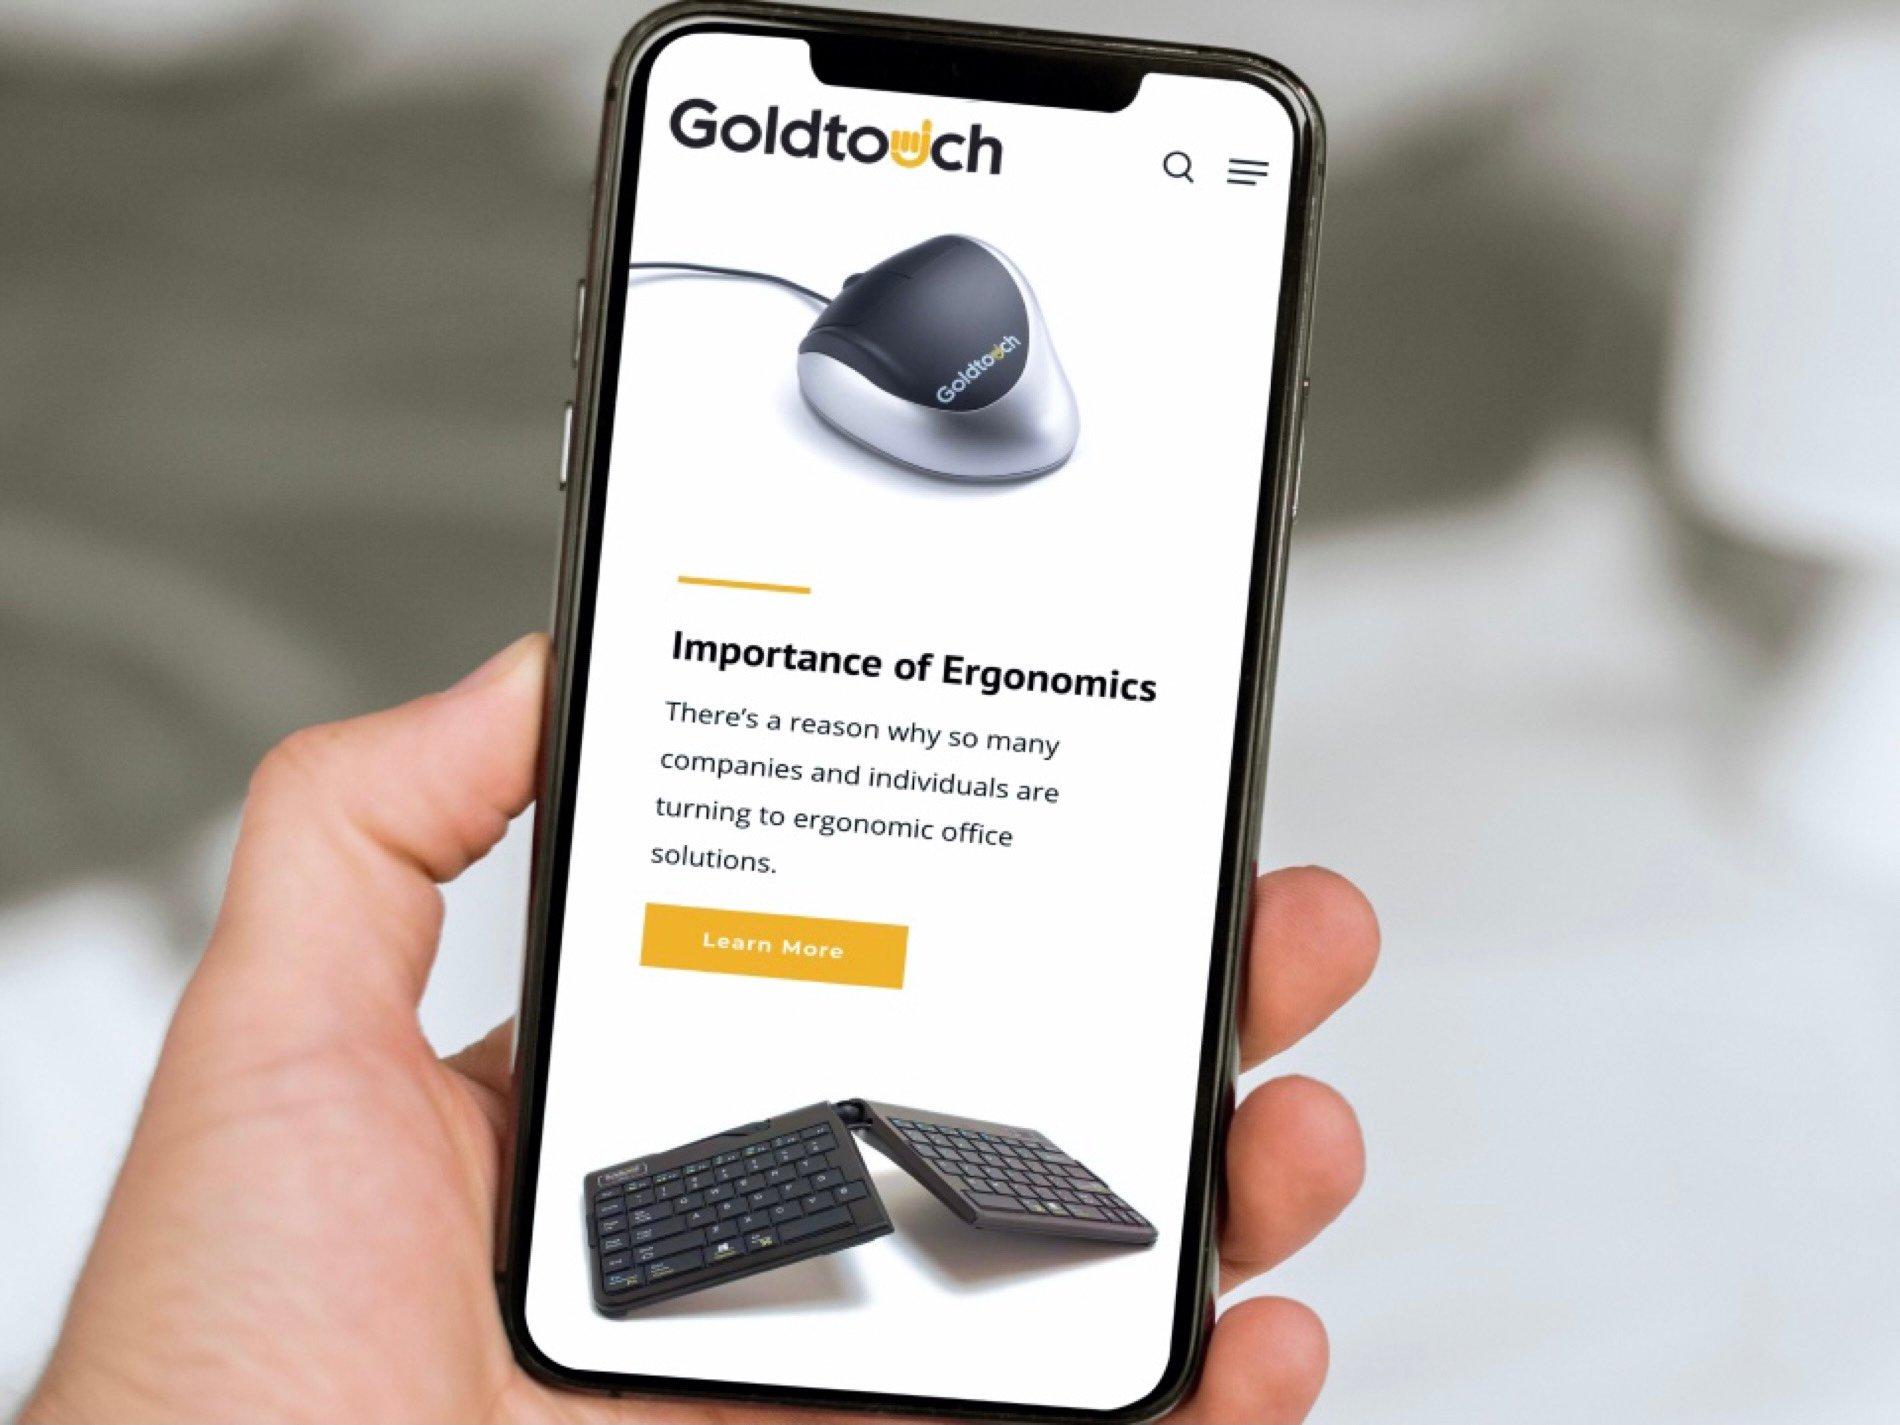 Technology Brand Website Mockup On Smartphone Screen